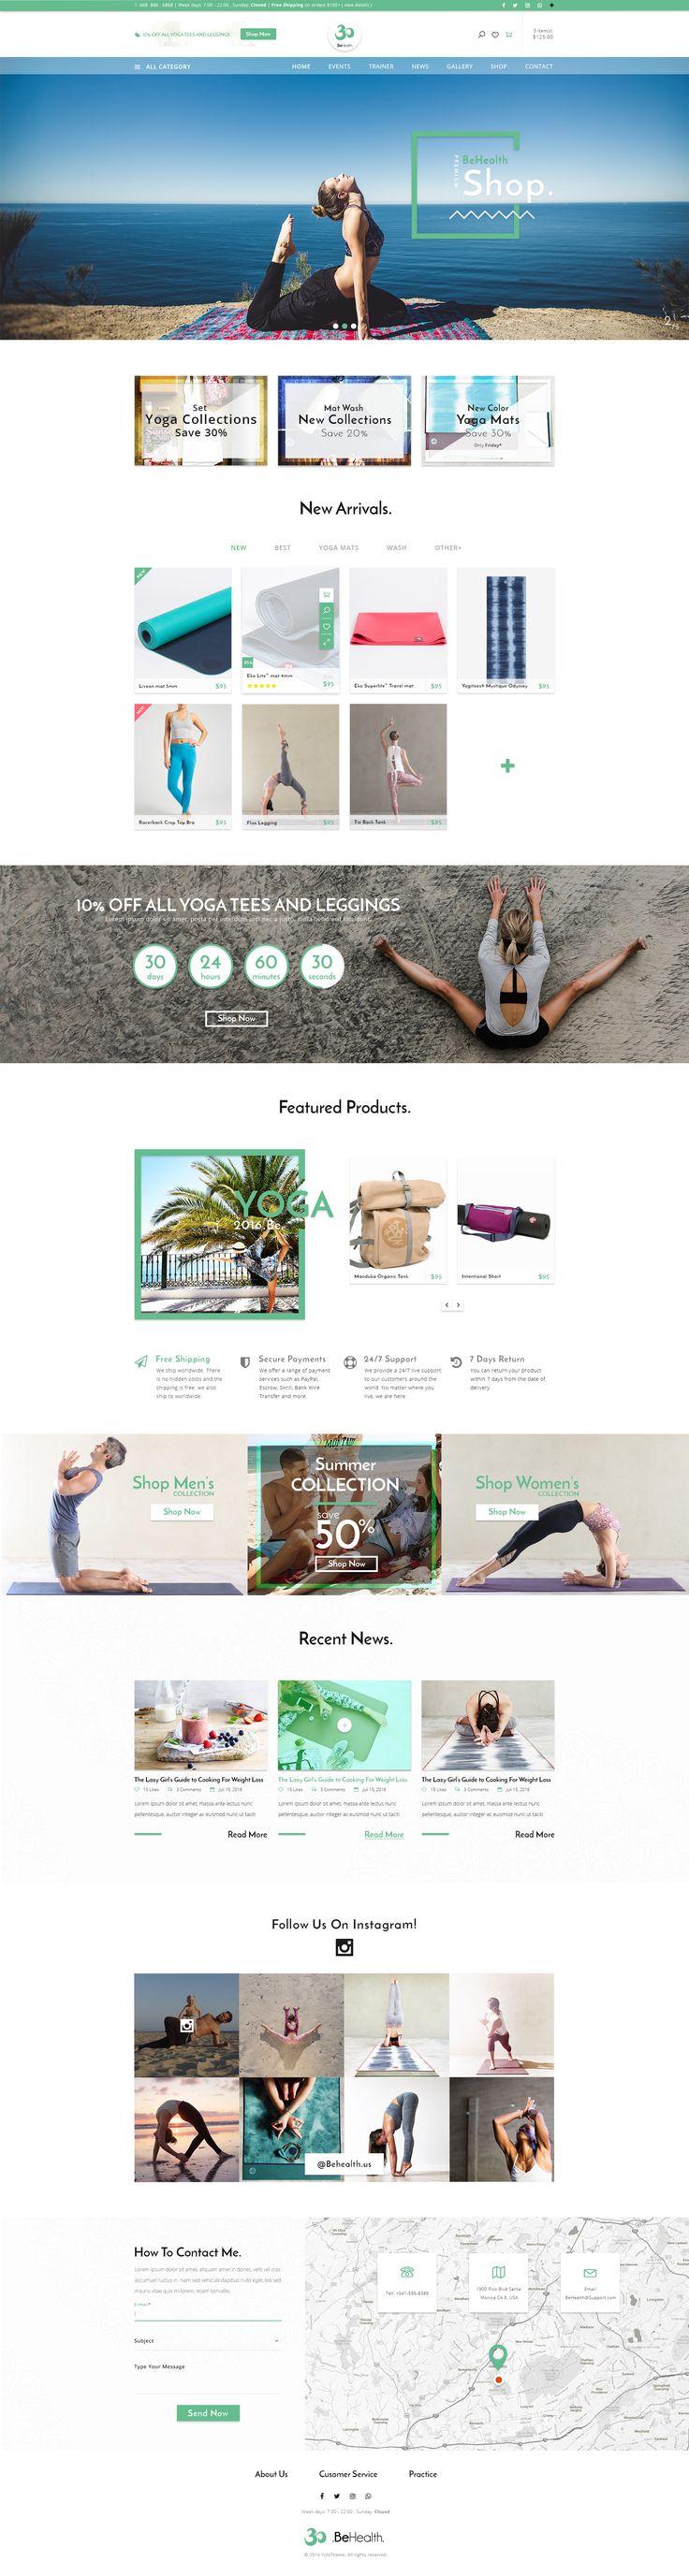 BeHealth - Yoga & Health Center PSD Template